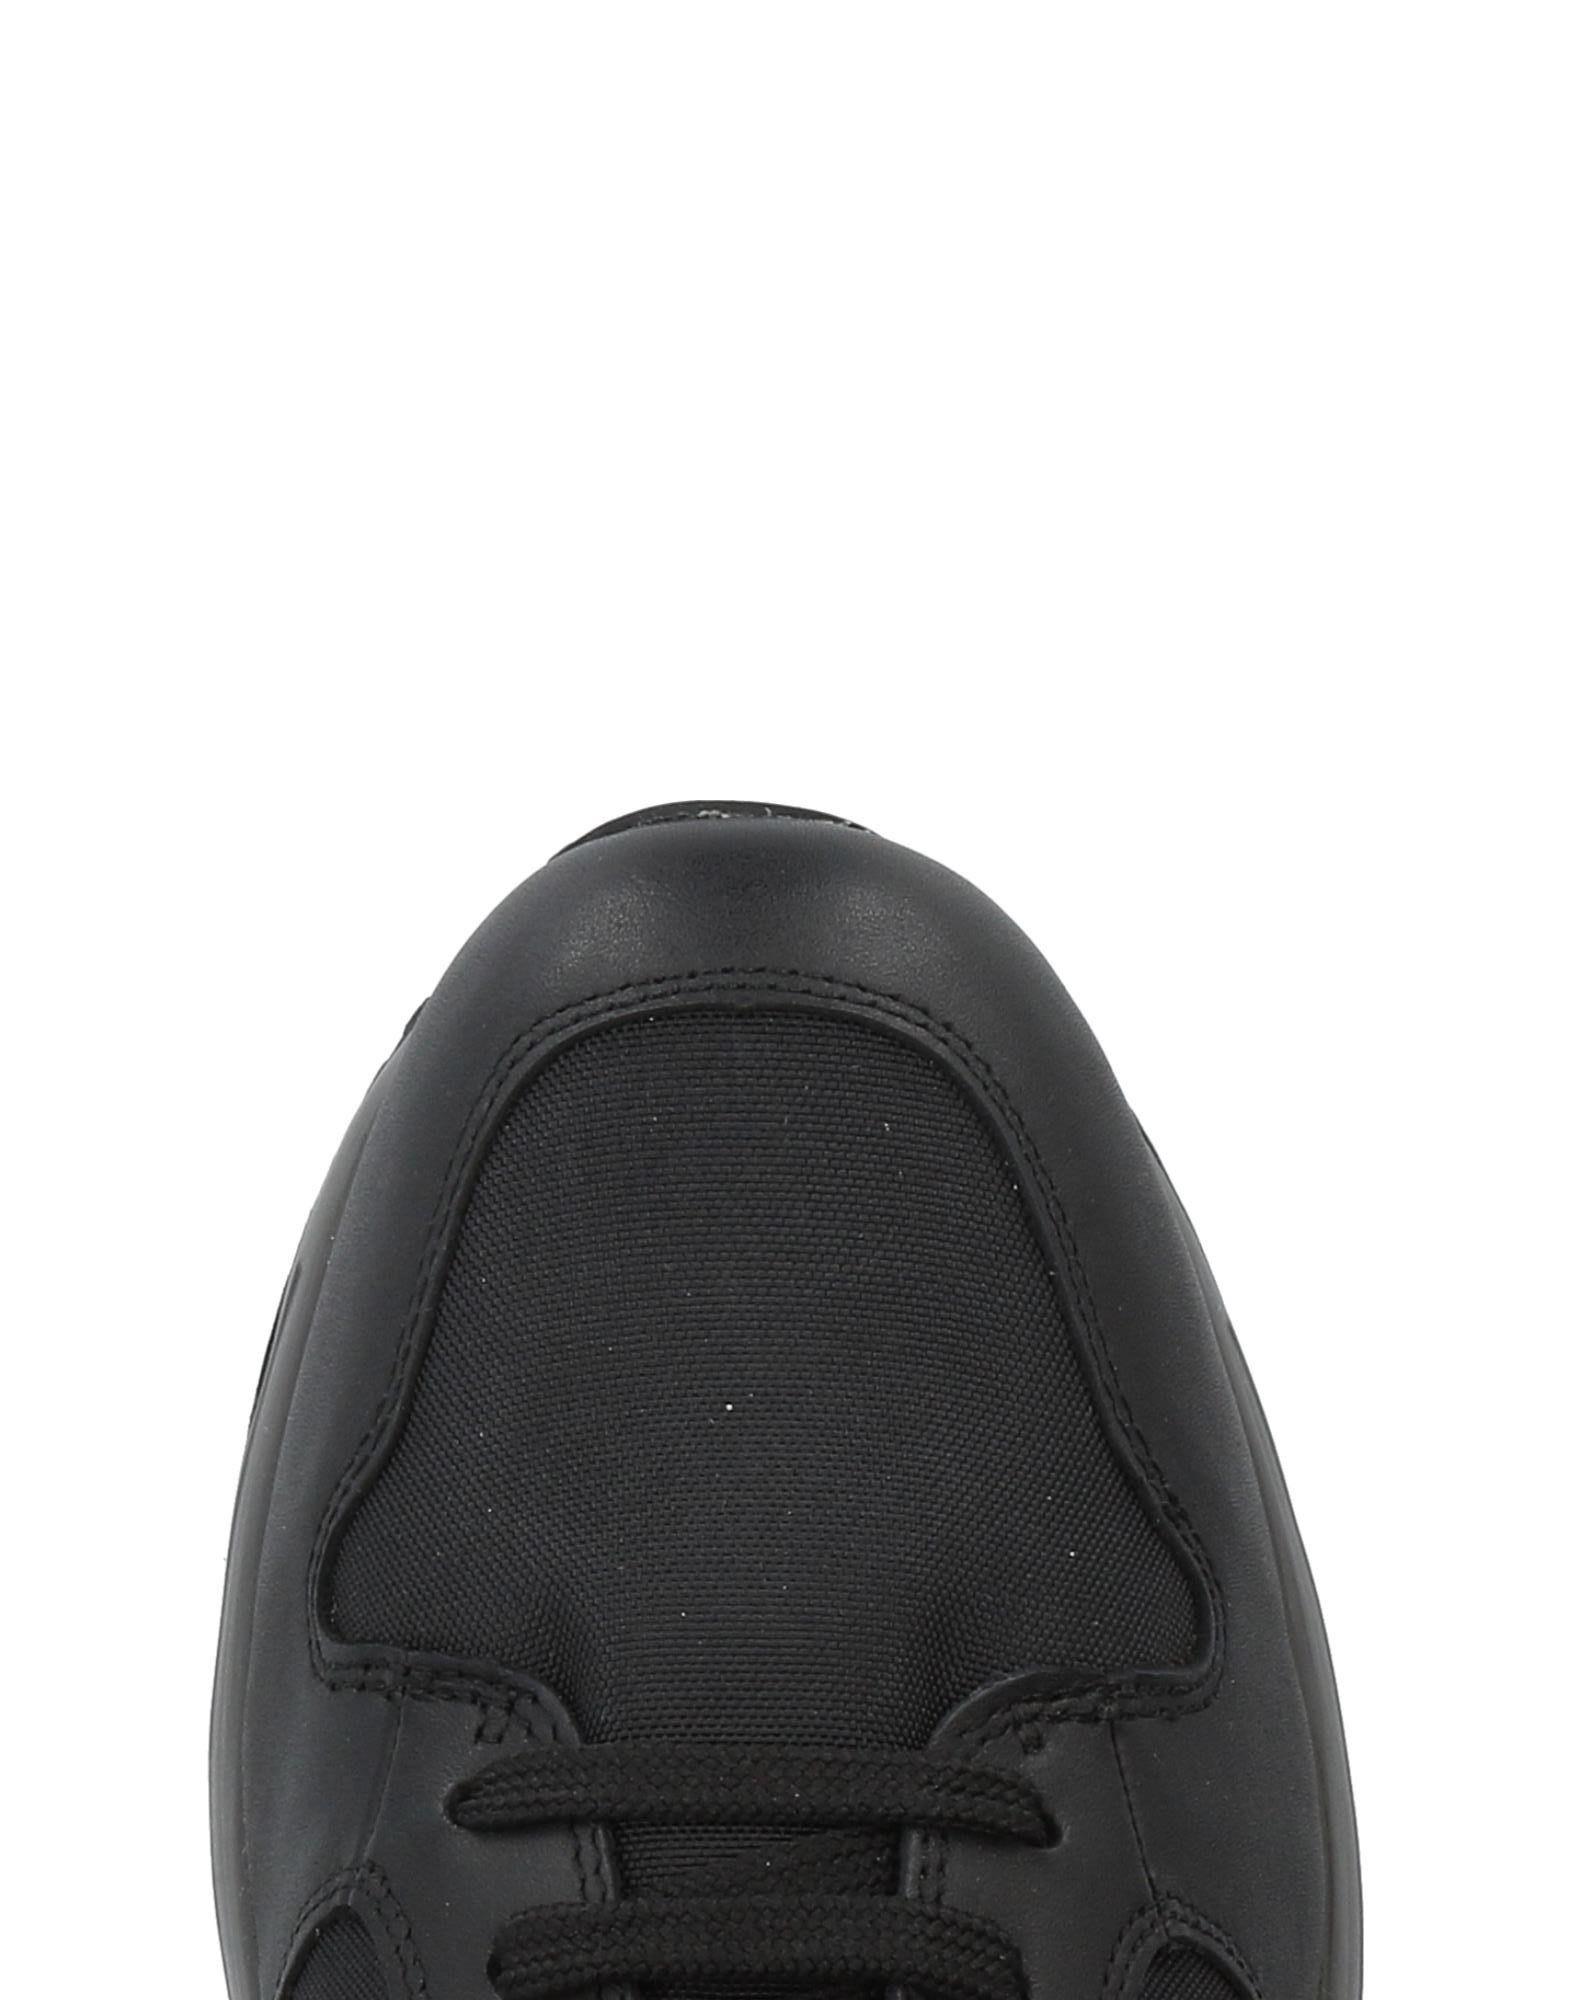 Geox Sneakers Schuhe Herren  11418332RI Heiße Schuhe Sneakers 3e51e0